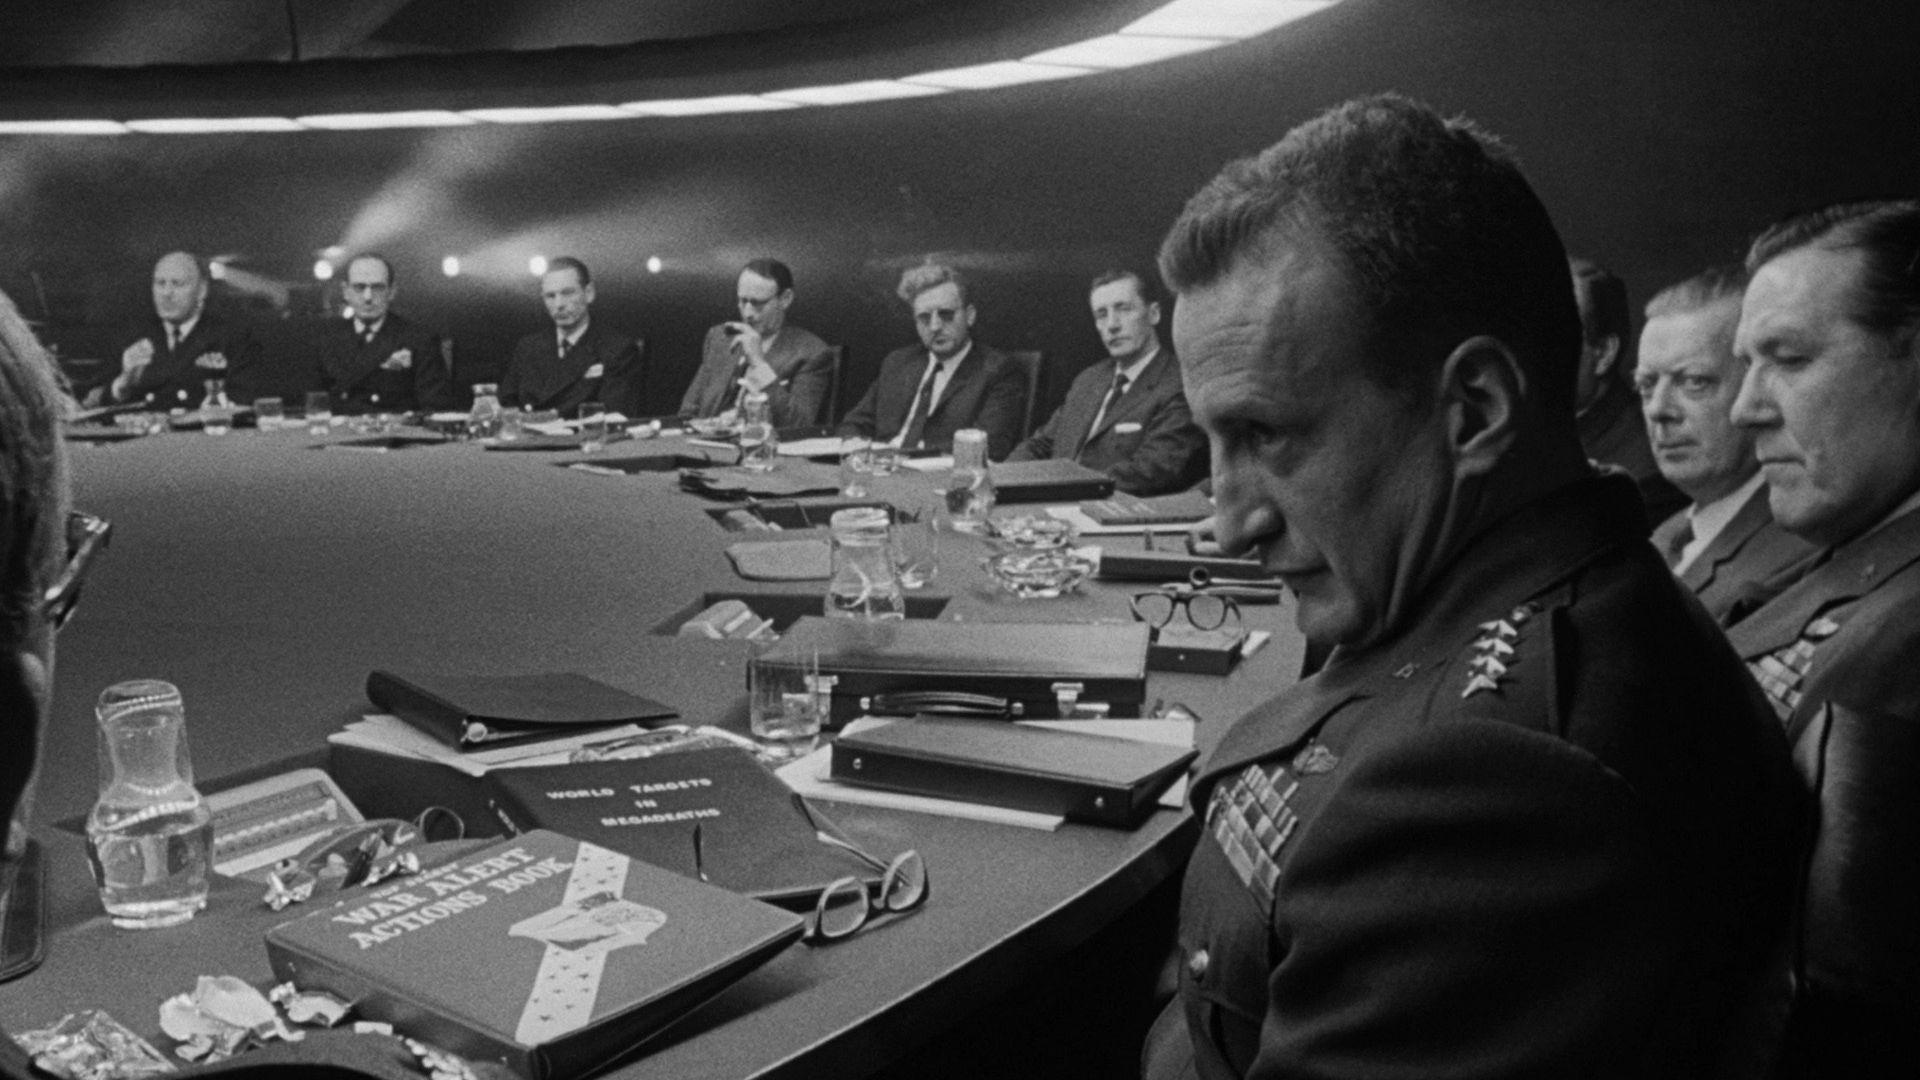 Top 250 фильмов IMDb Как я научился не волноваться и полюбил атомную бомбу (Dr. Strangelove or How I Learned to Stop Worrying and Love the Bomb) (1964)